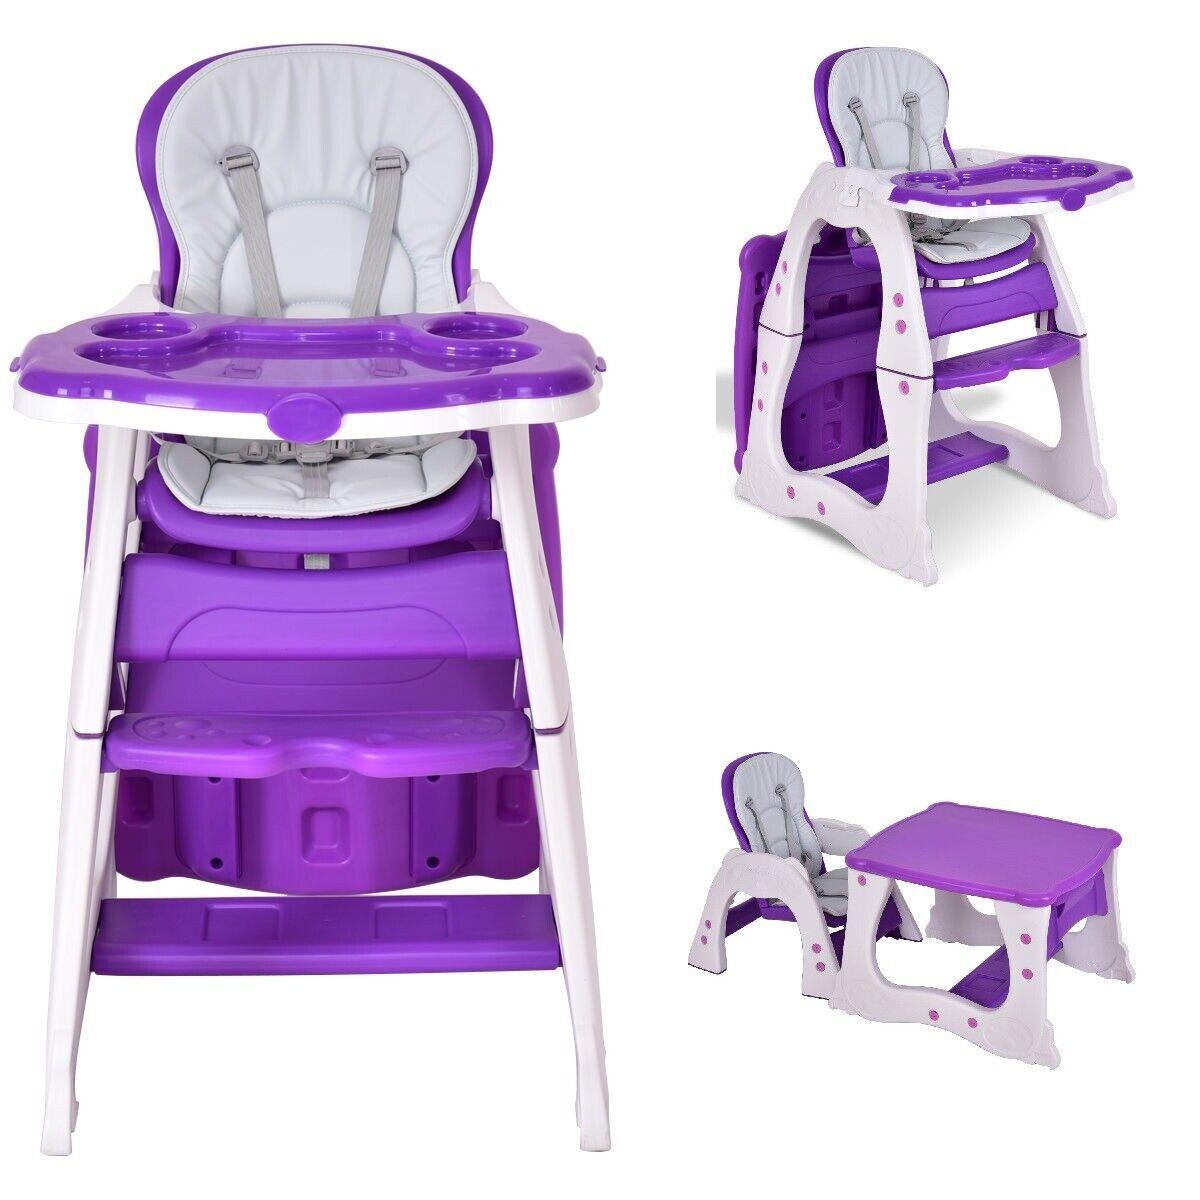 High Chair Baby 3 In 1 Purple Girl Feeding Chair Toddler Con